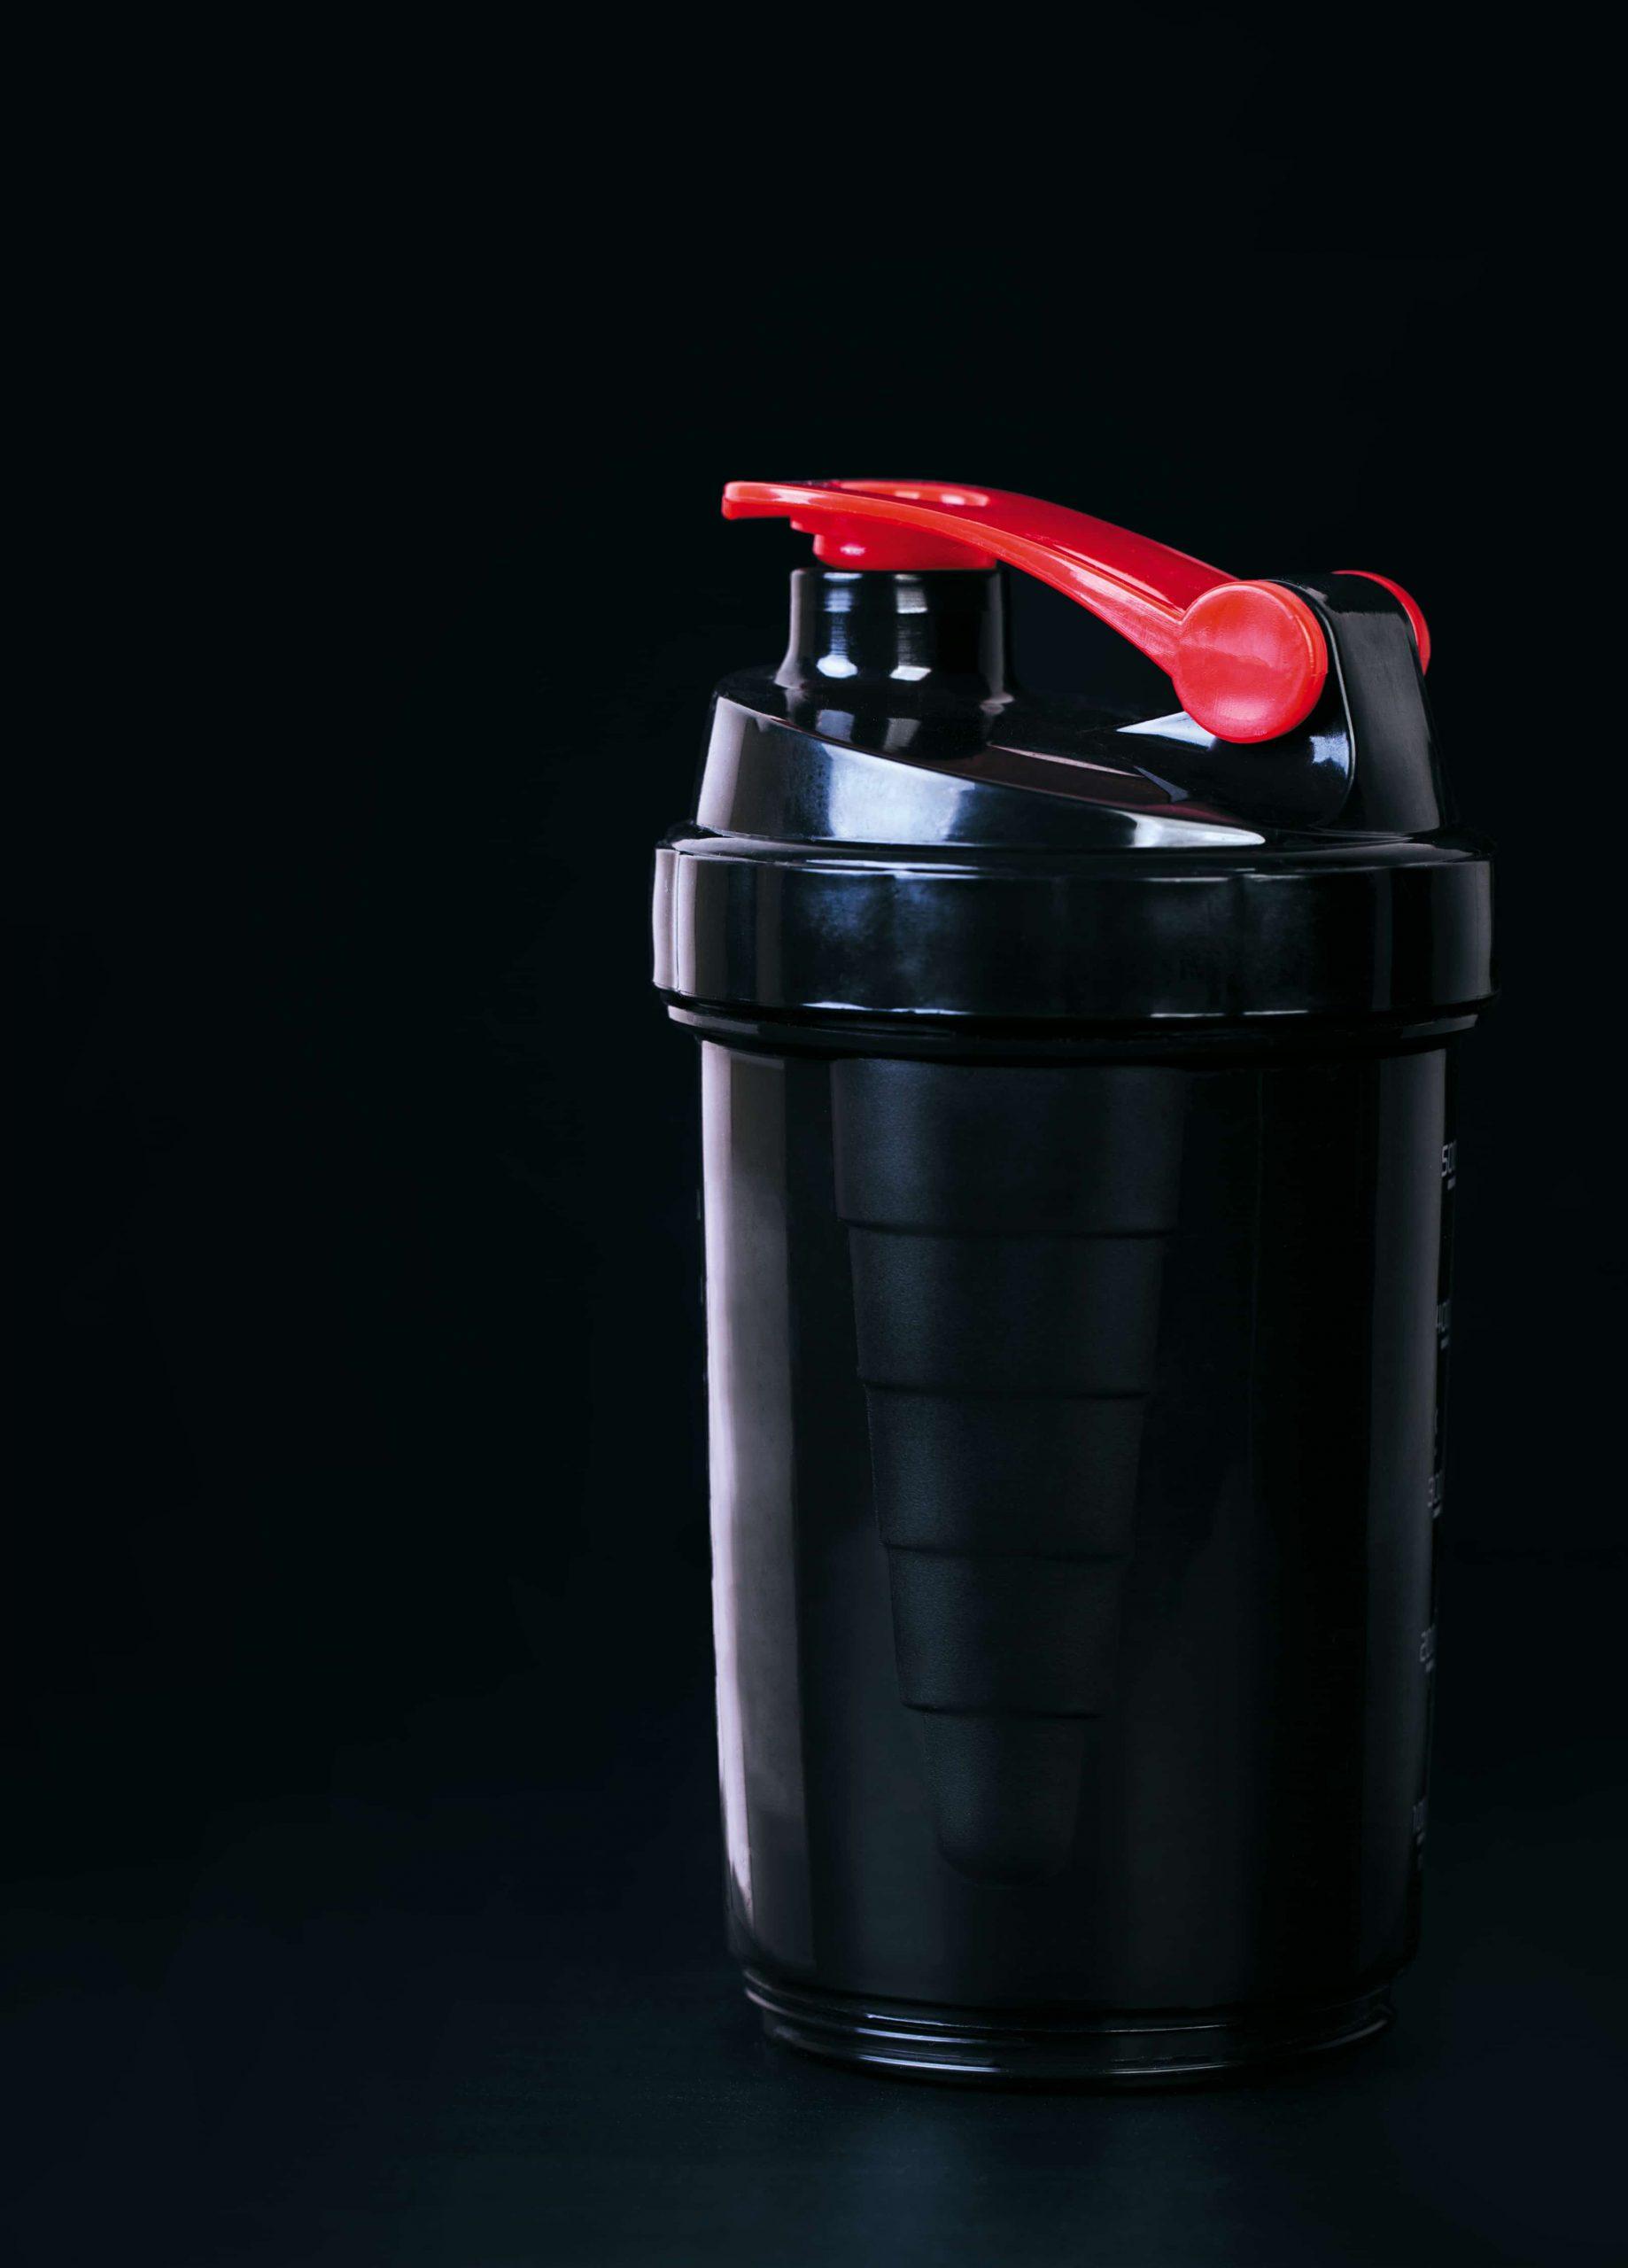 shaker-principale-xcyp1